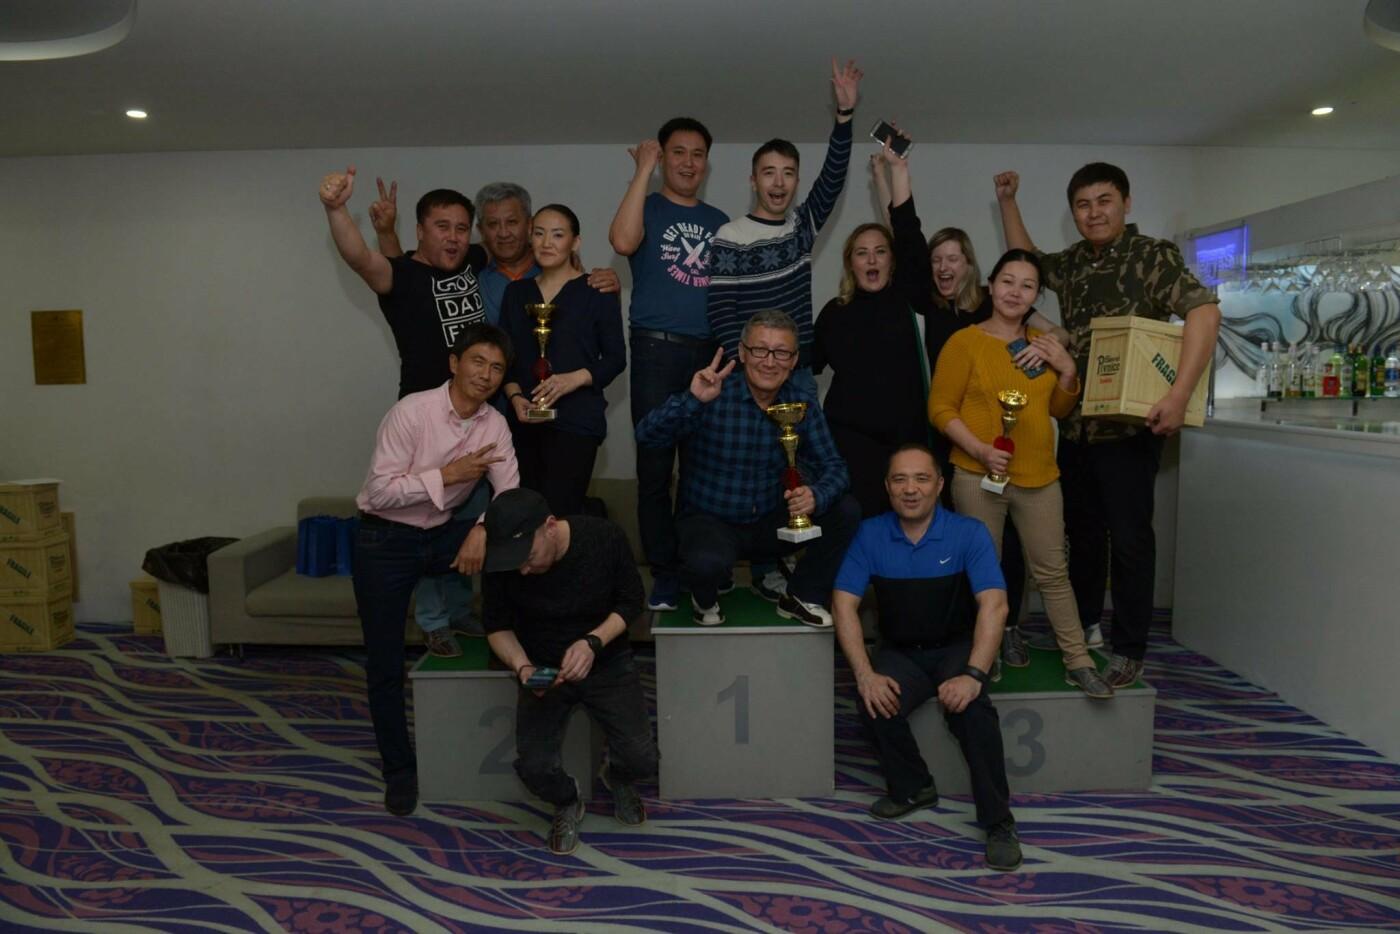 II турнир по боулингу среди журналистов прошел в Алматы (ФОТО), фото-23